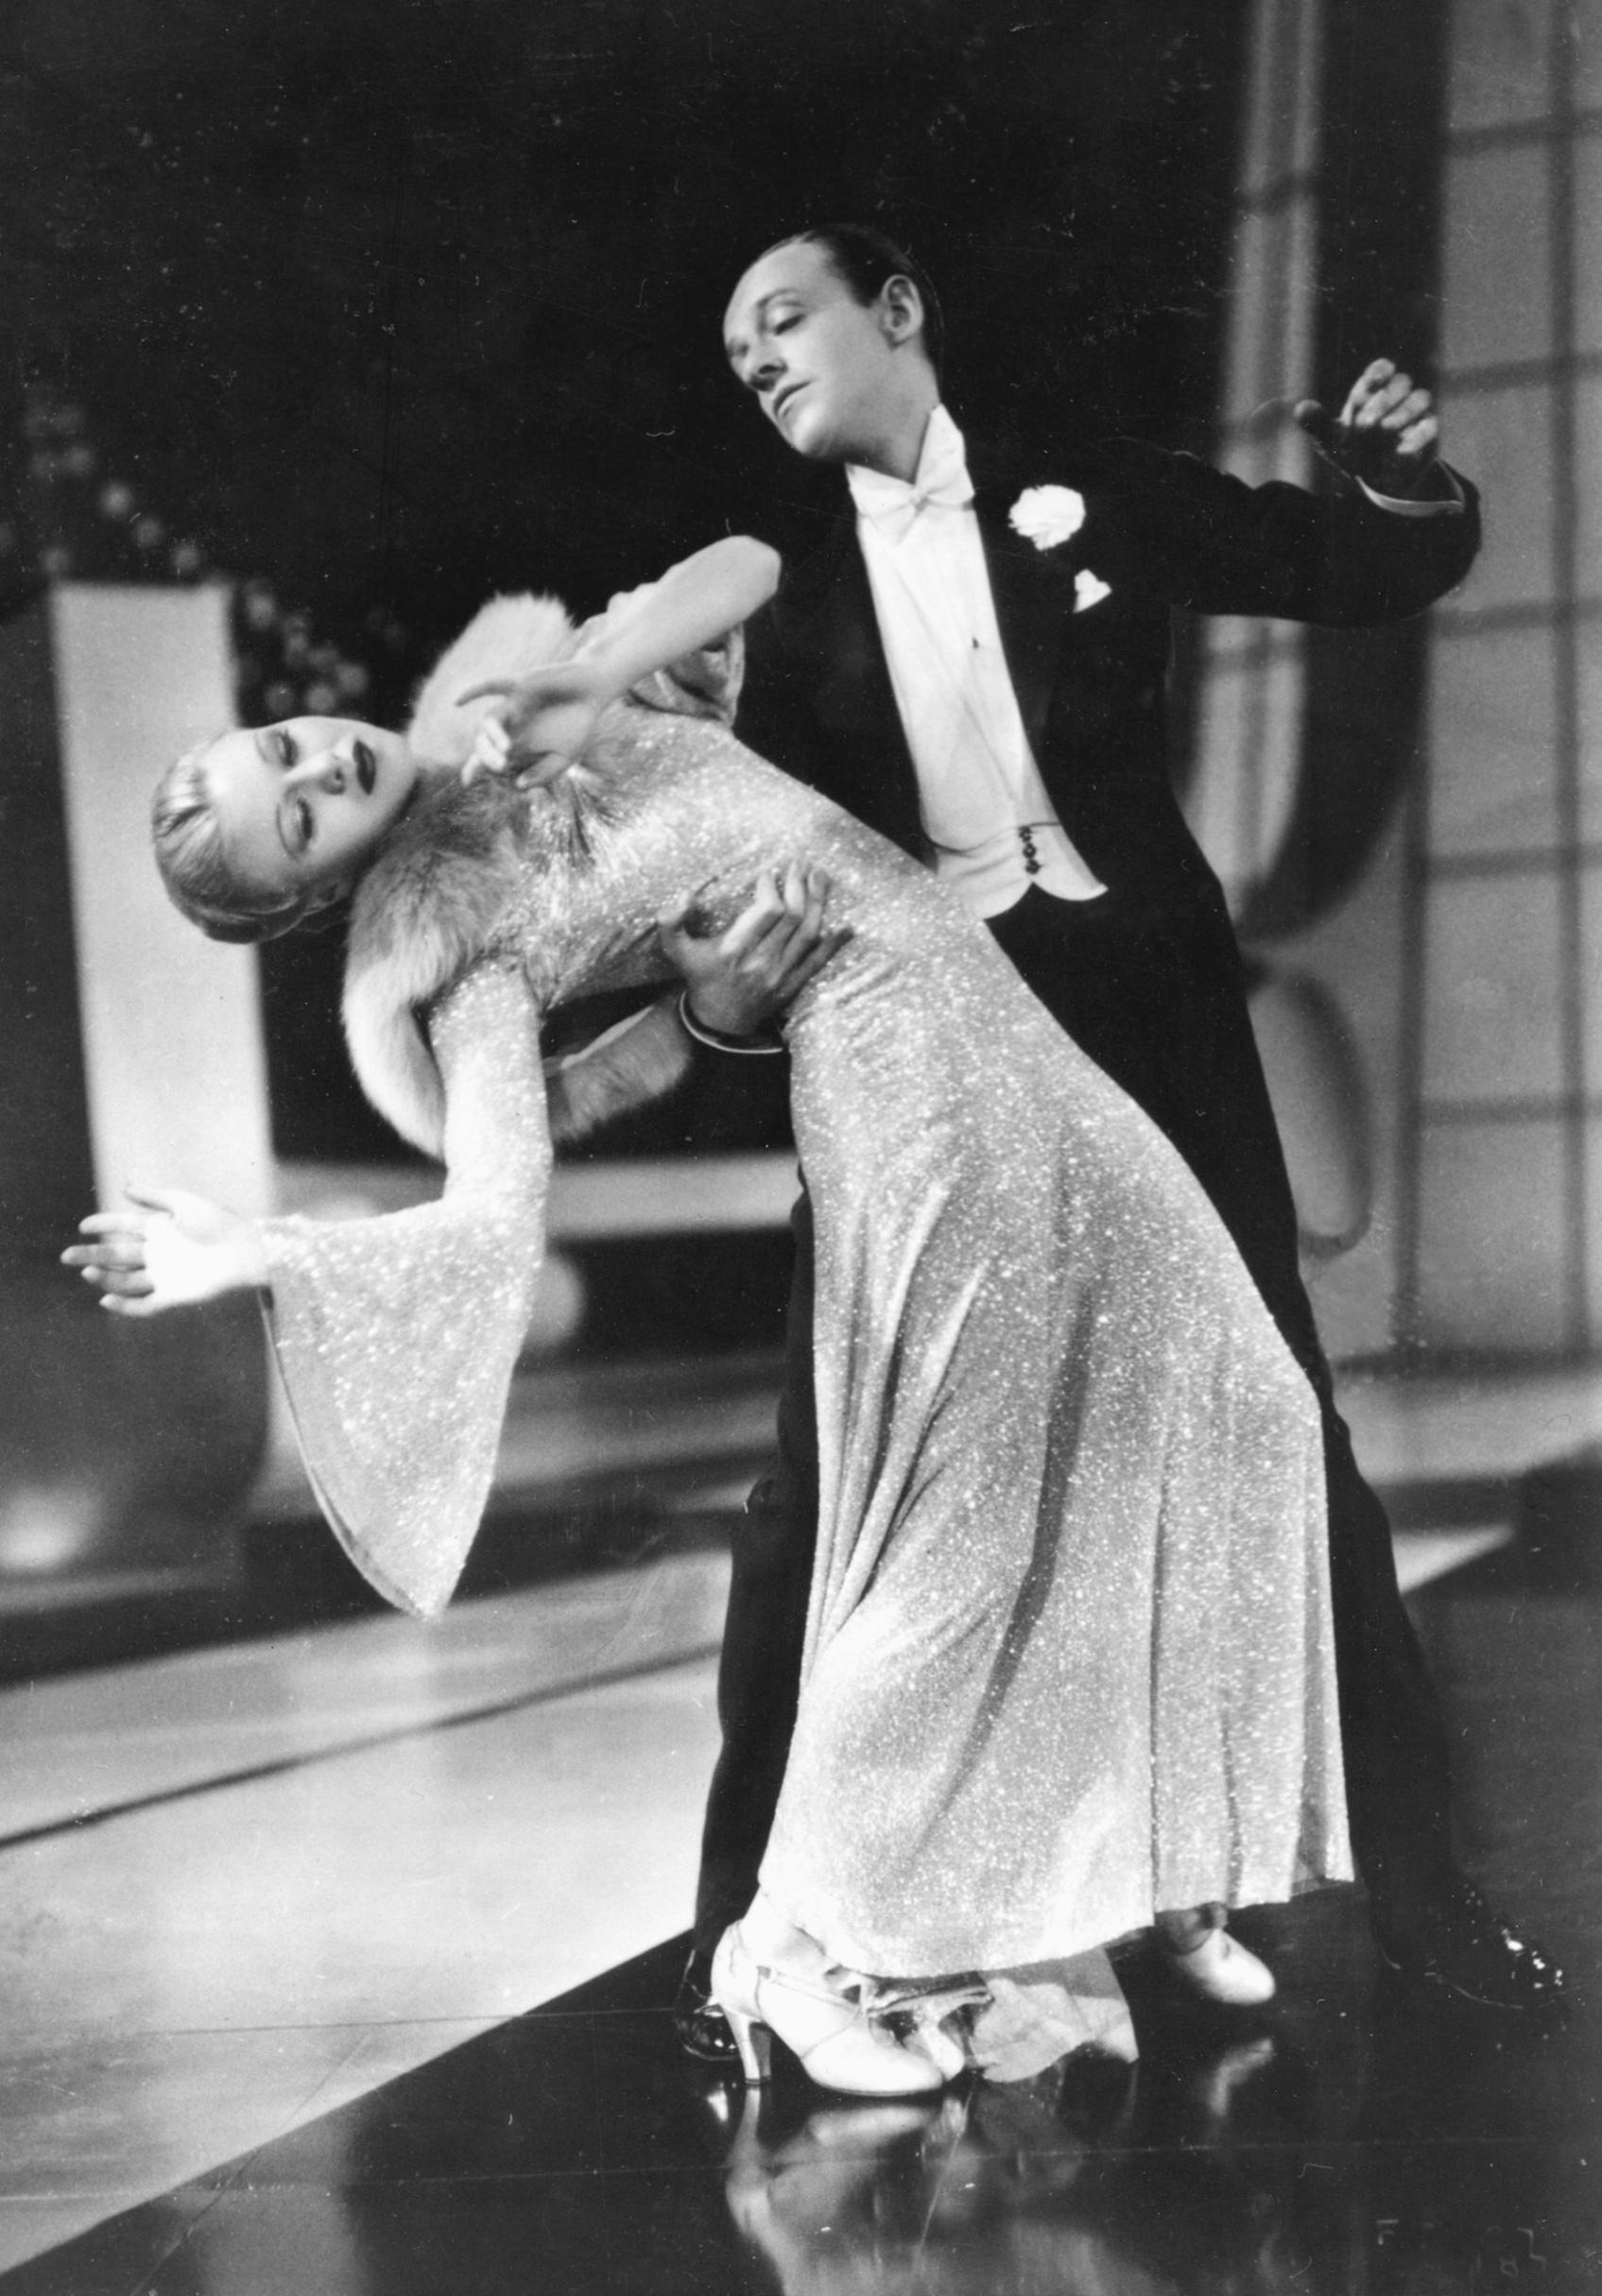 vremya-svinga-film-1936